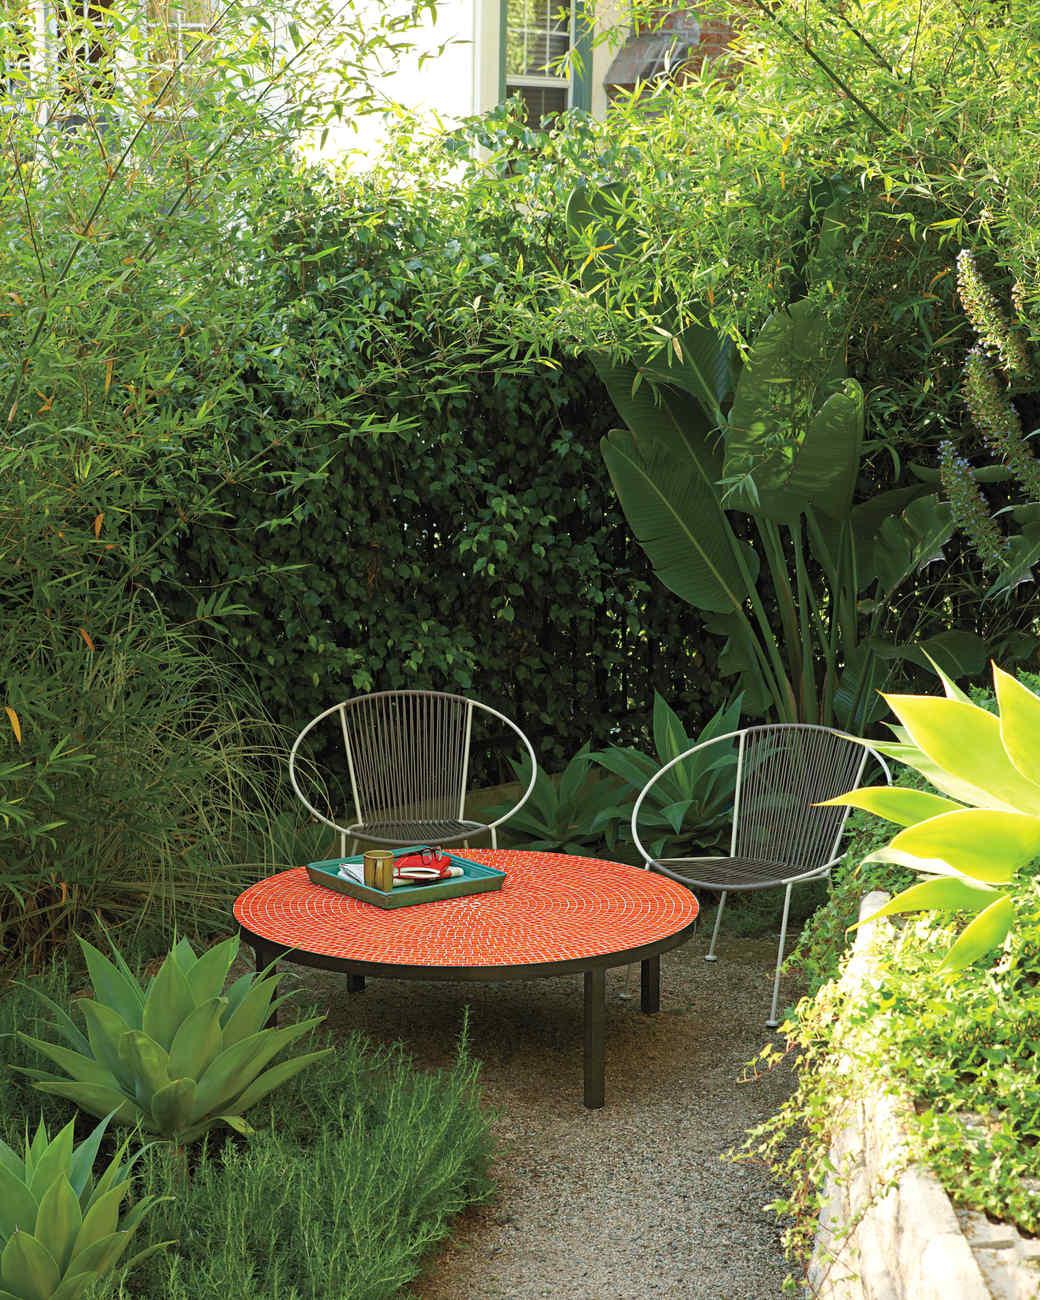 anderson-house-yard-0911mld107423.jpg